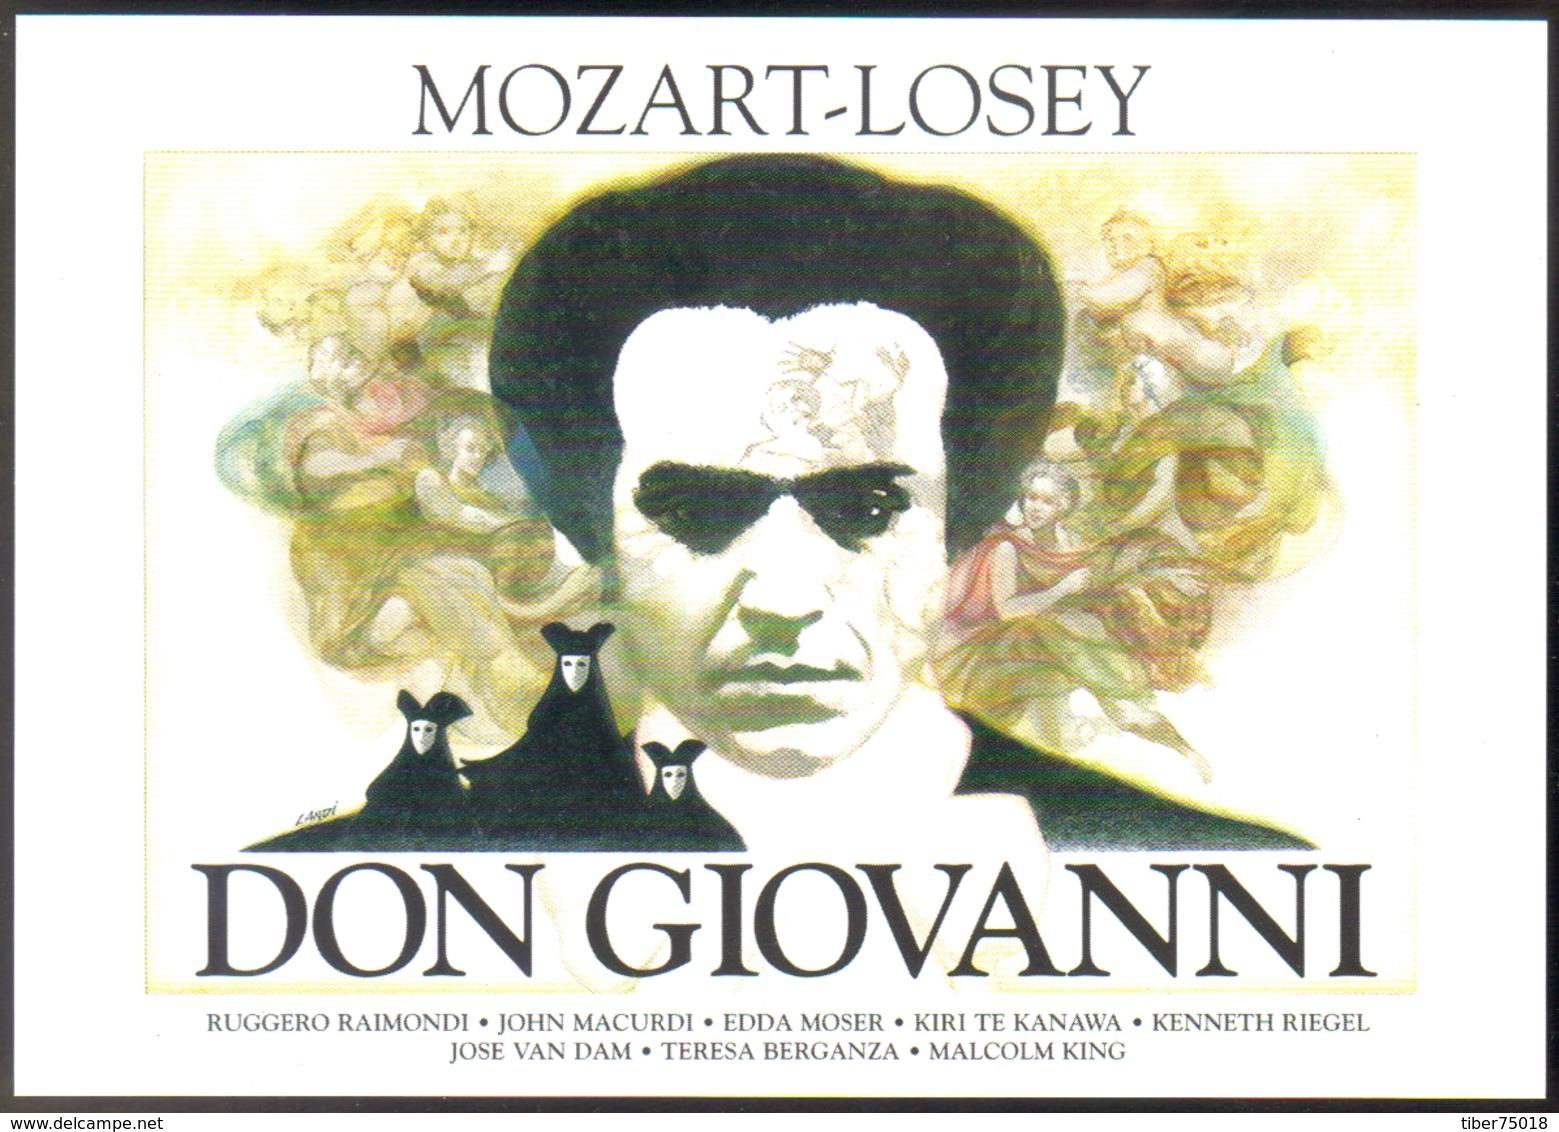 Carte Postale : Don Giovanni (Mozart - Losey) - Illustration Landi (affiche, Film, Cinéma) - Posters On Cards